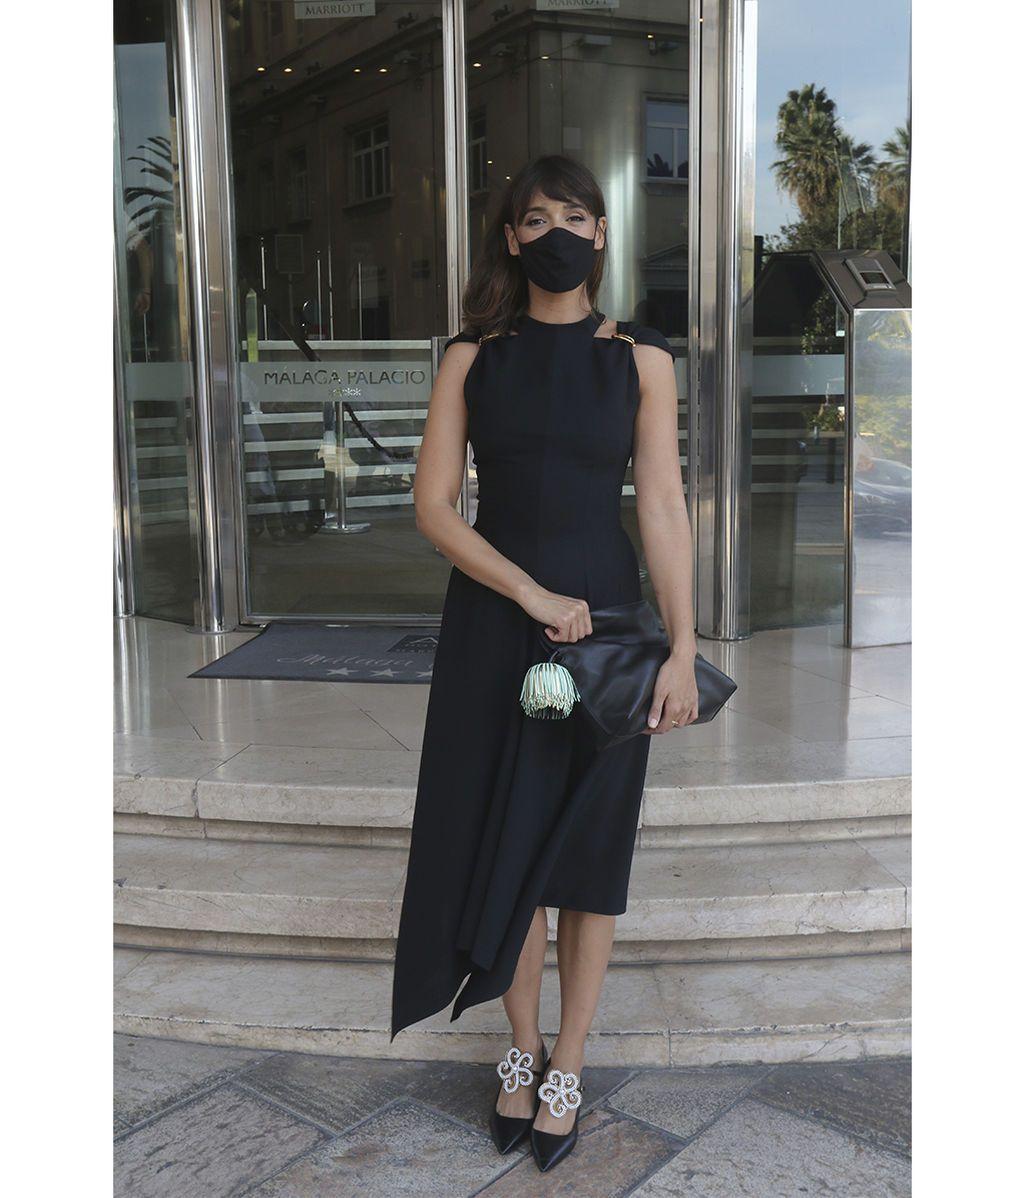 Belen Cuesta posa frente al hotel con su mascarilla